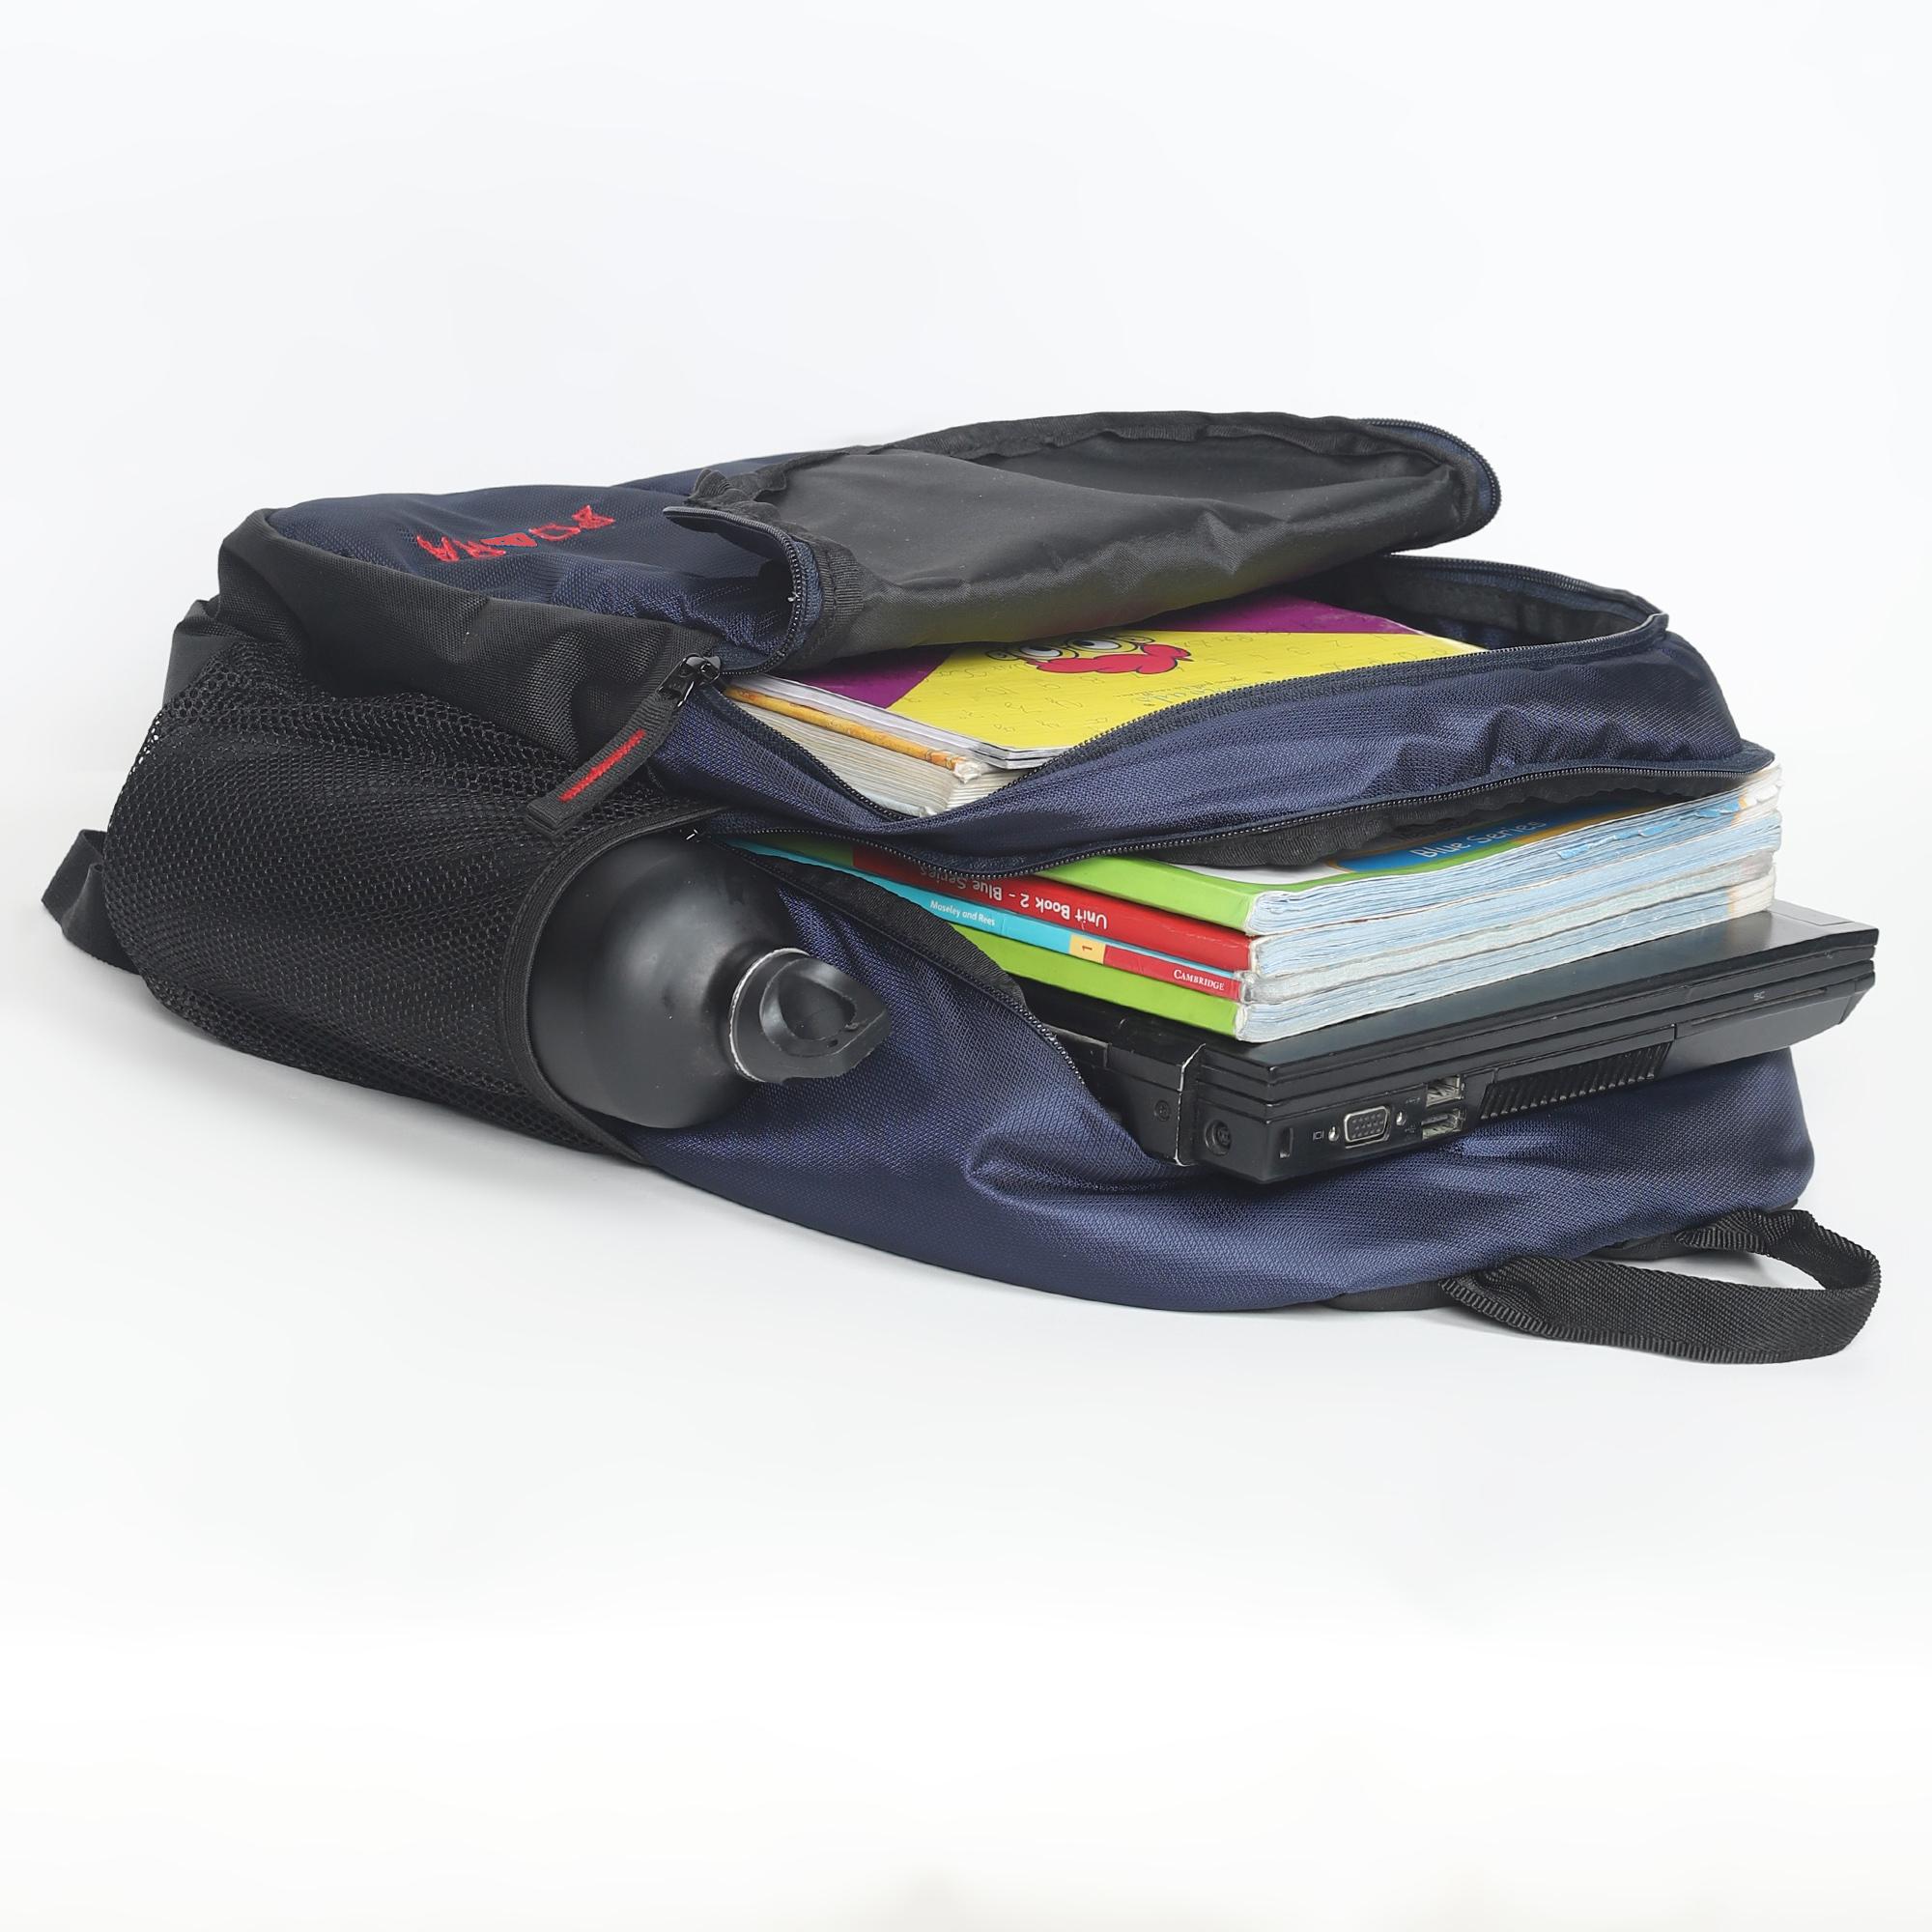 FOARA AQUAFIRE 30L Historage NavyBlue Laptop Backpack